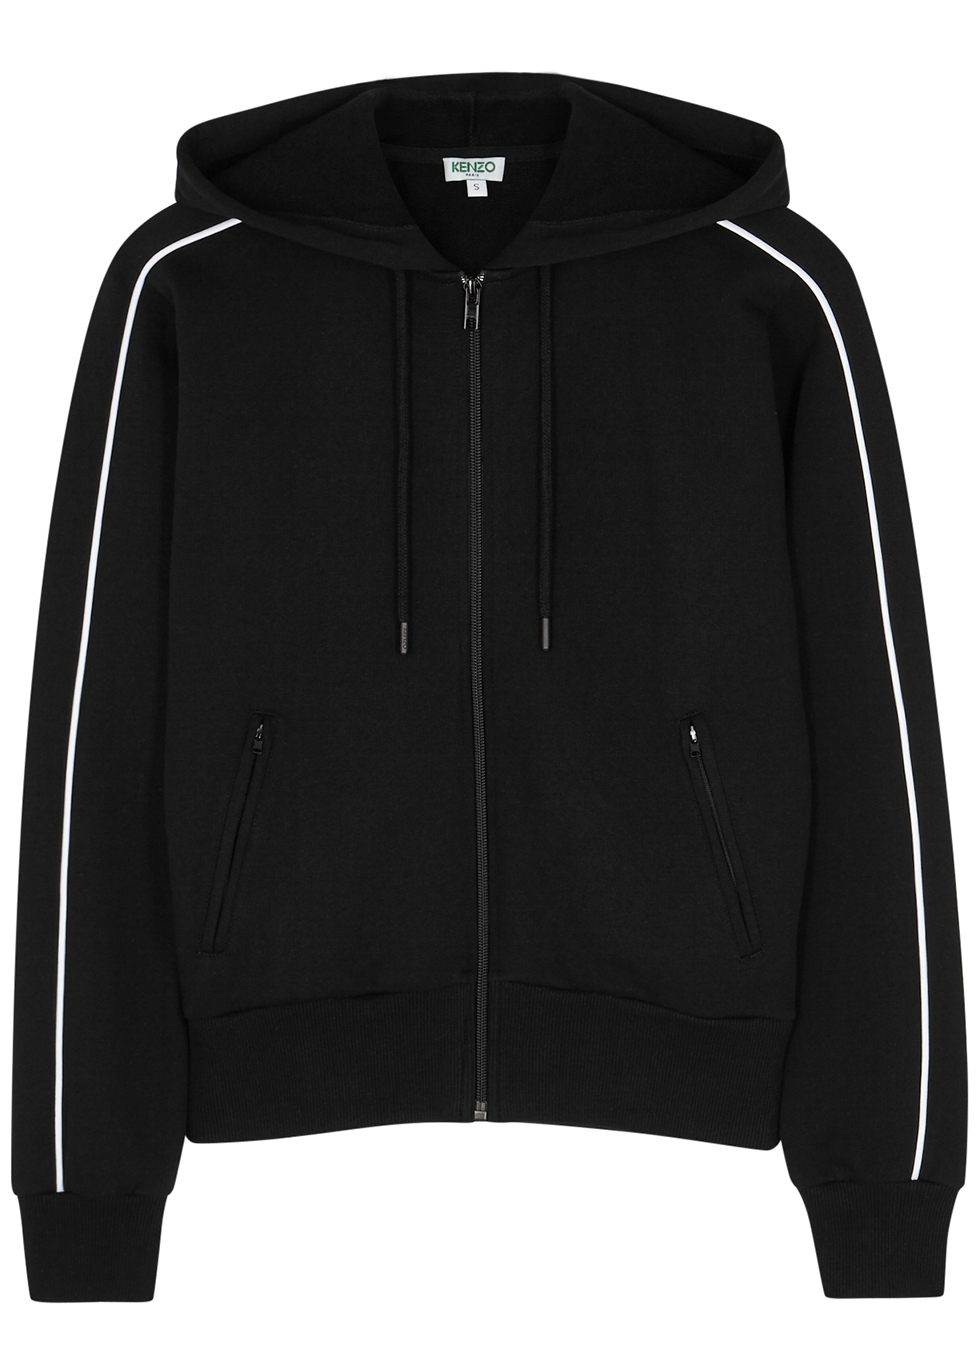 2bb6591f7d1 Kenzo - Designer Sweatshirts